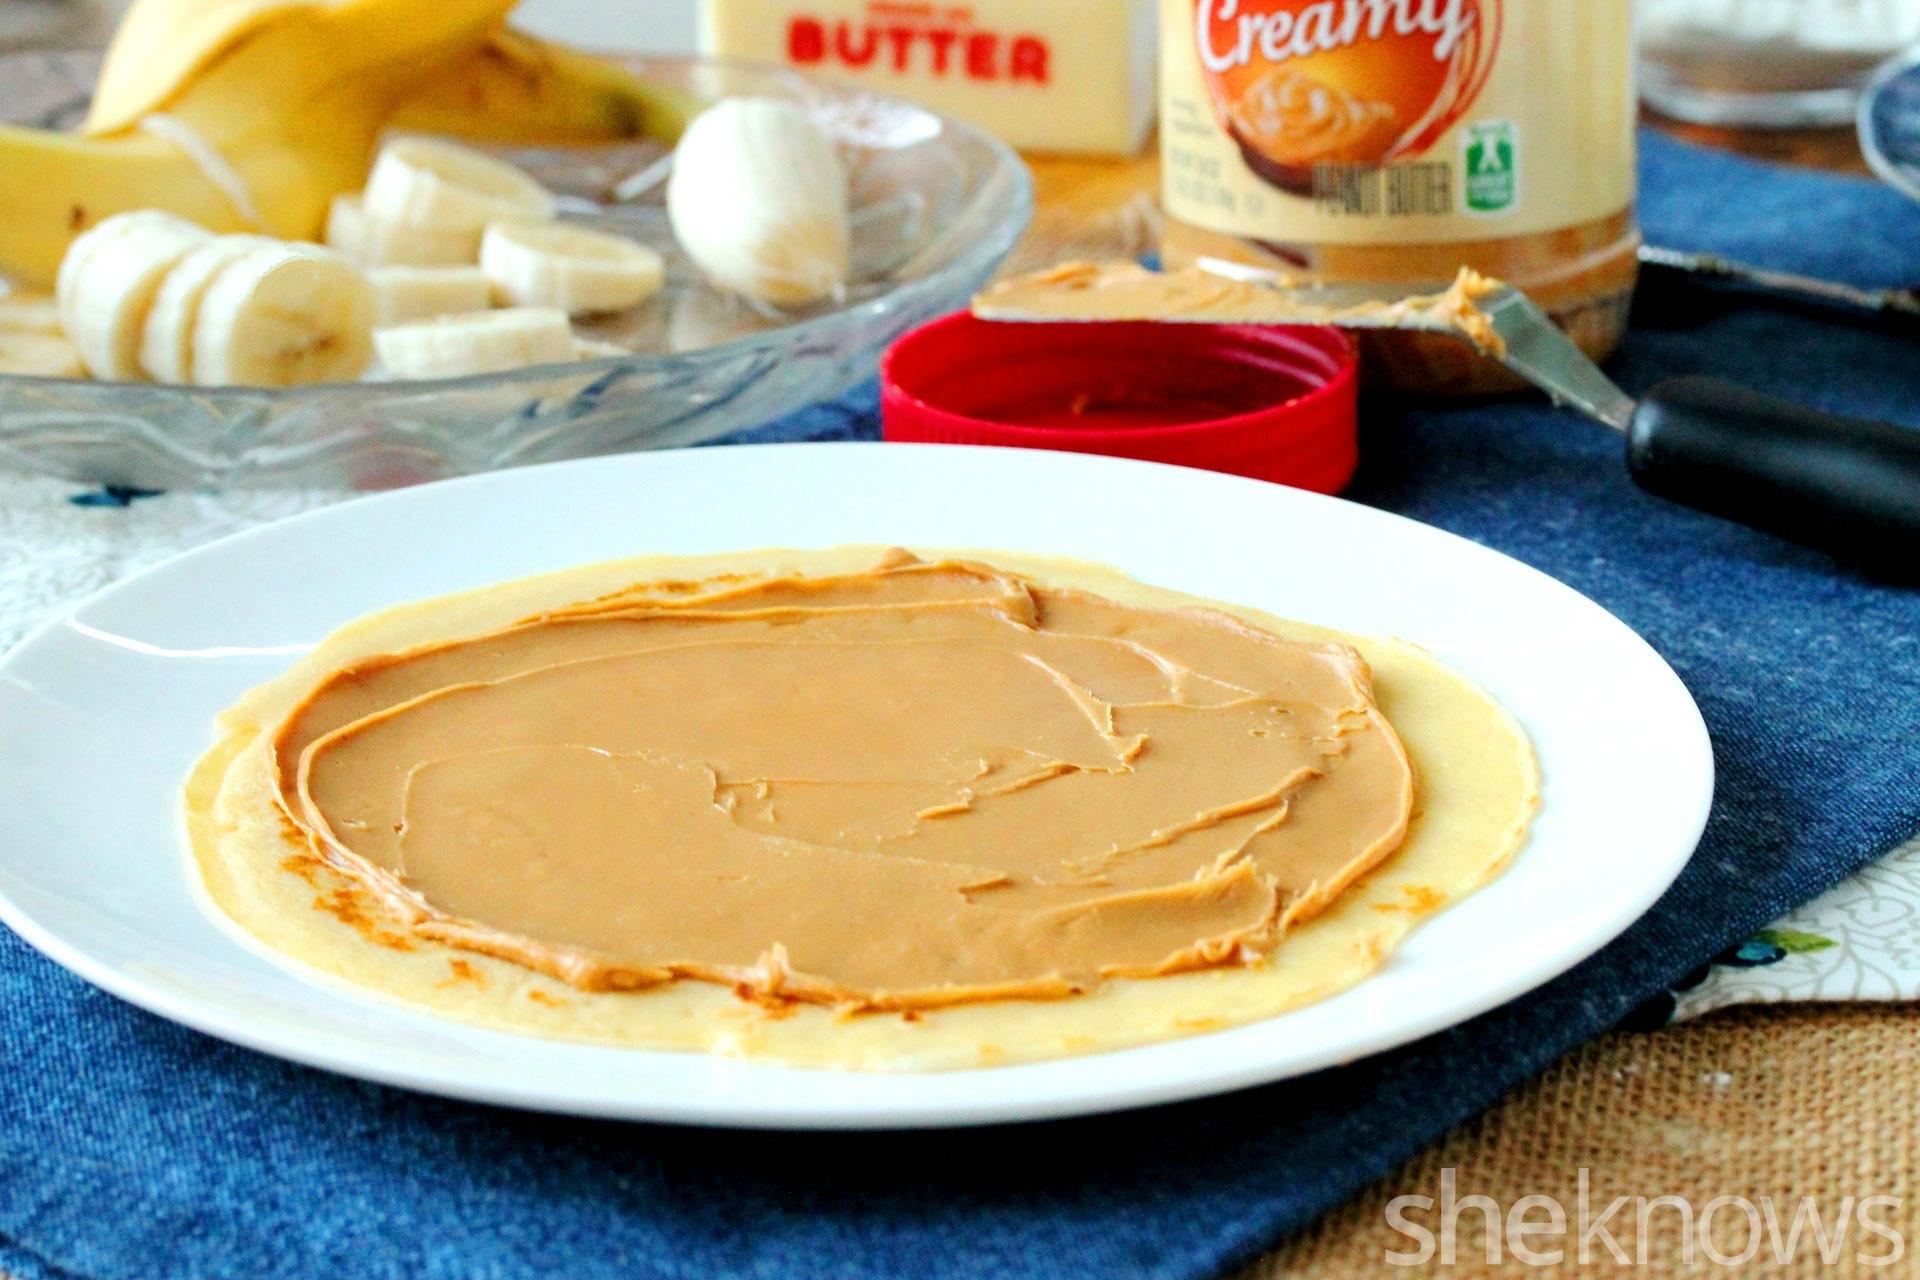 peanut butter on crepe